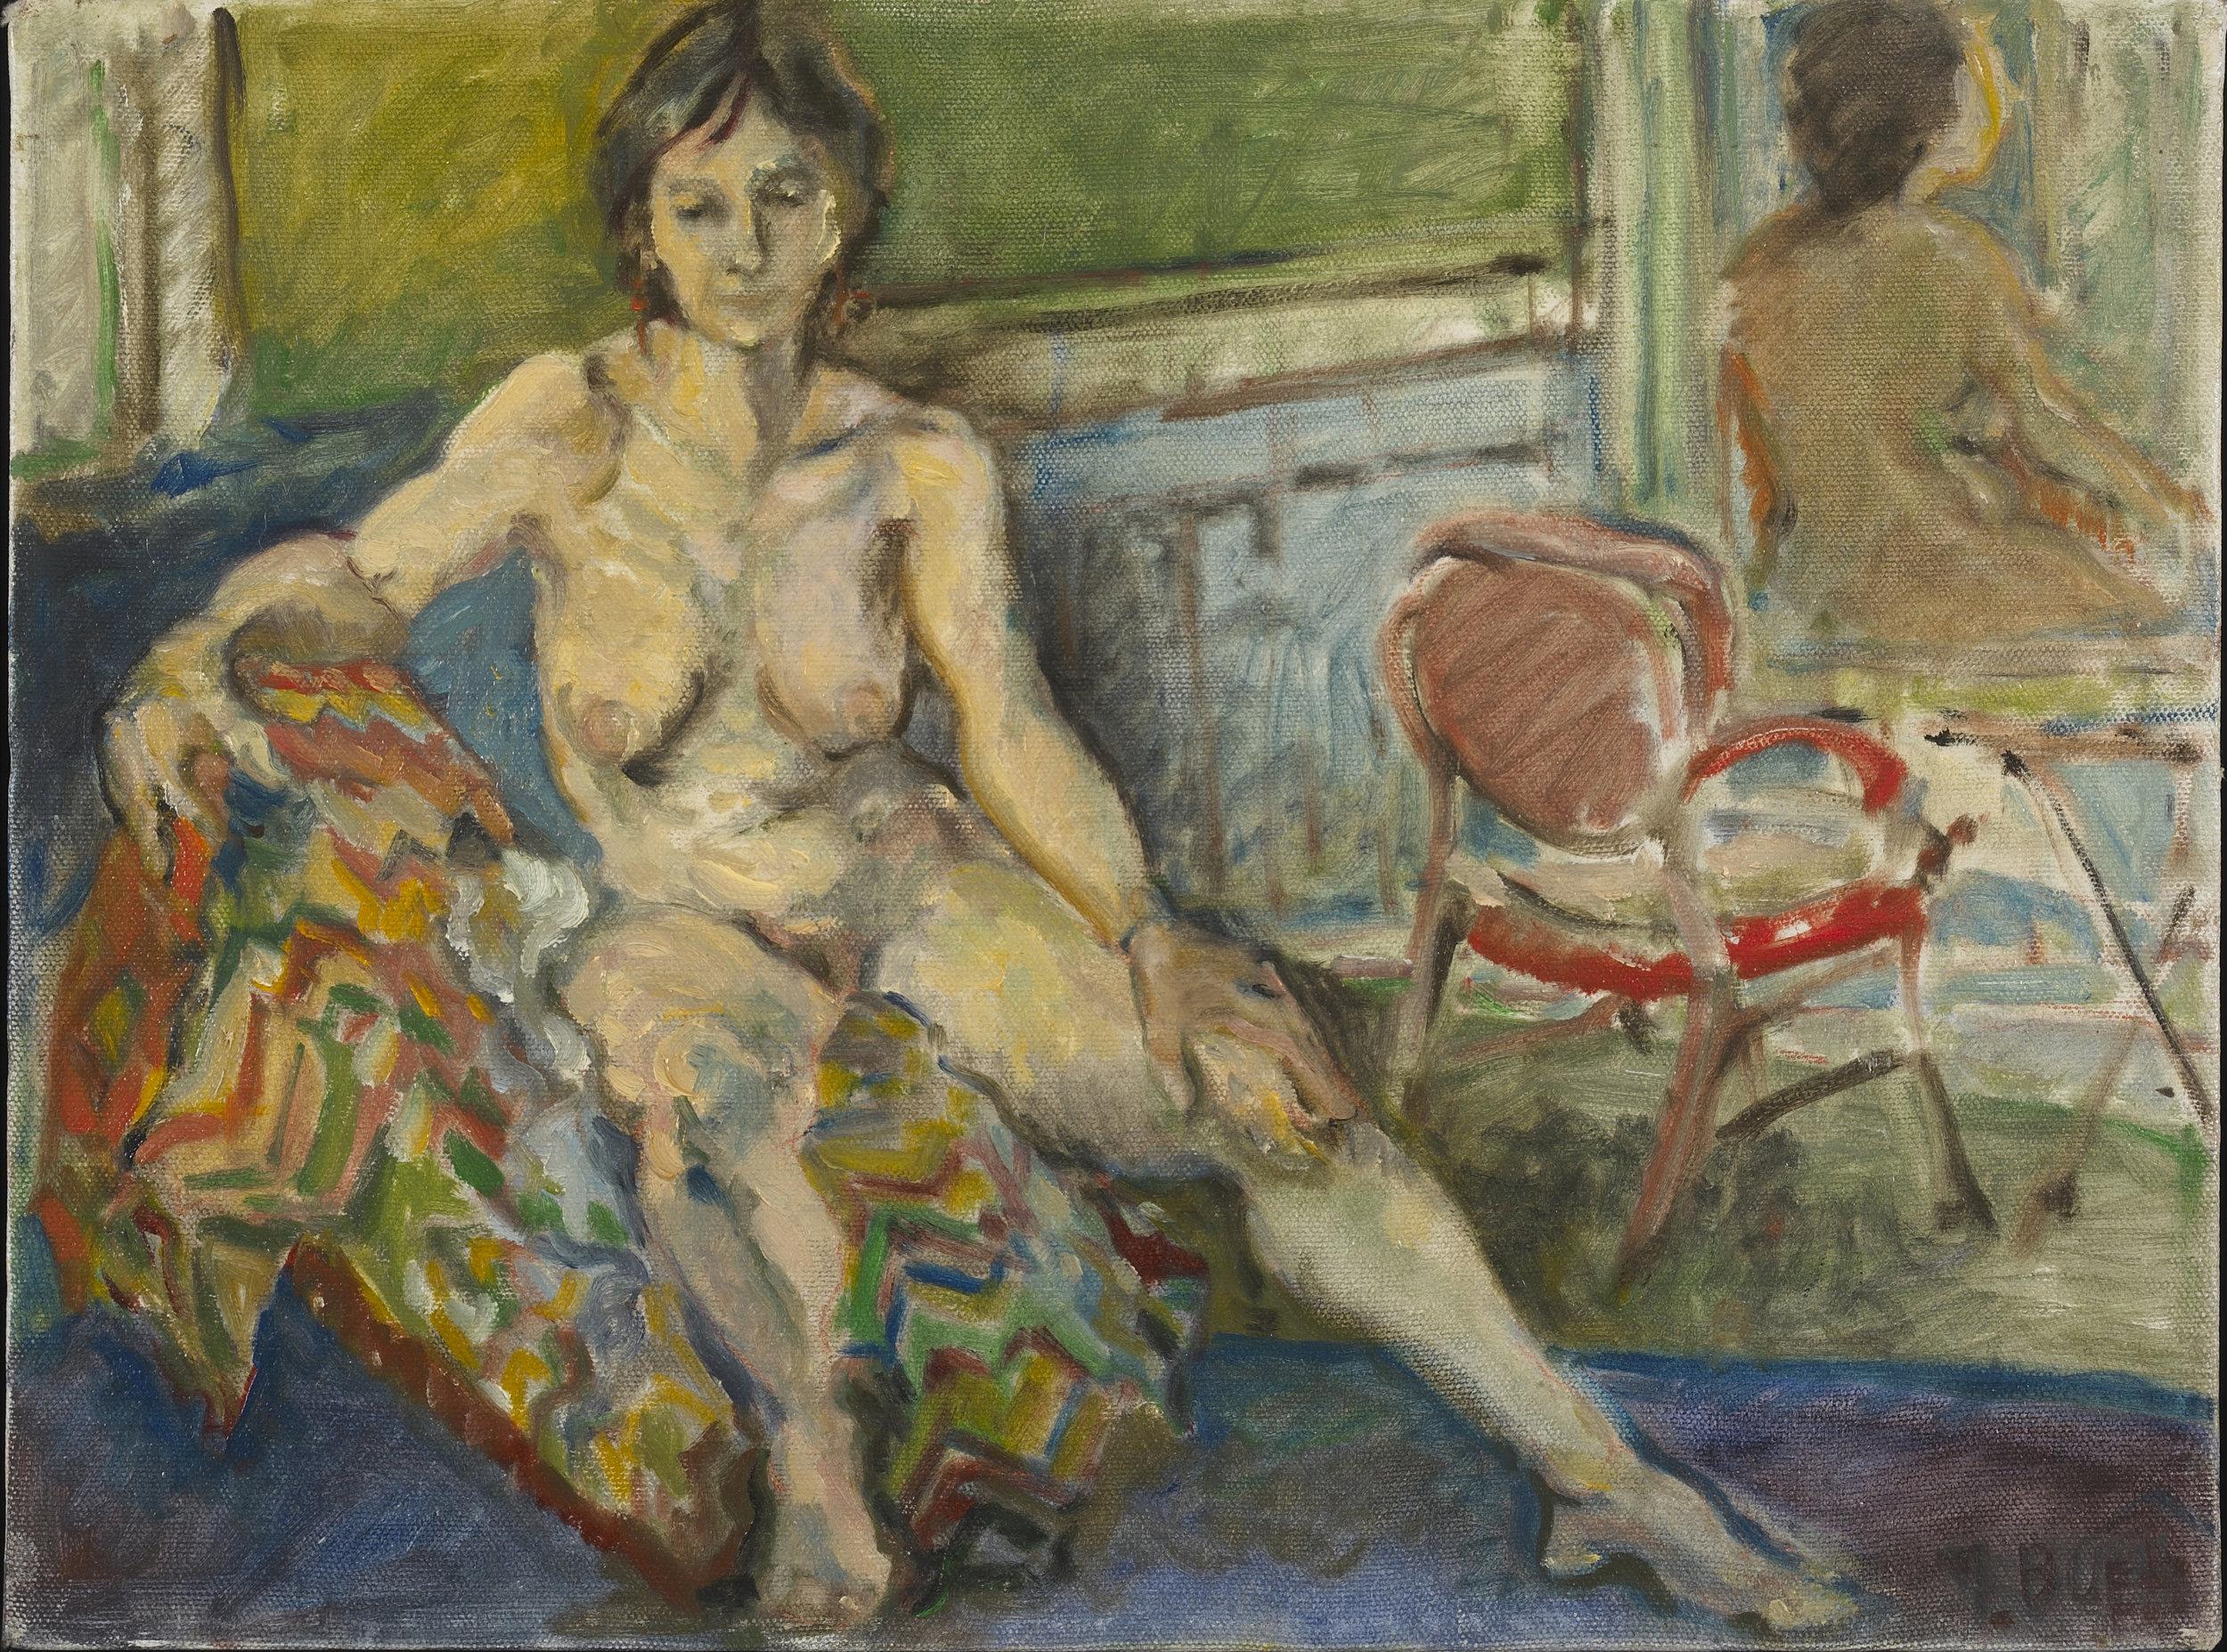 Contemplative Woman 14x16-oil on canvas